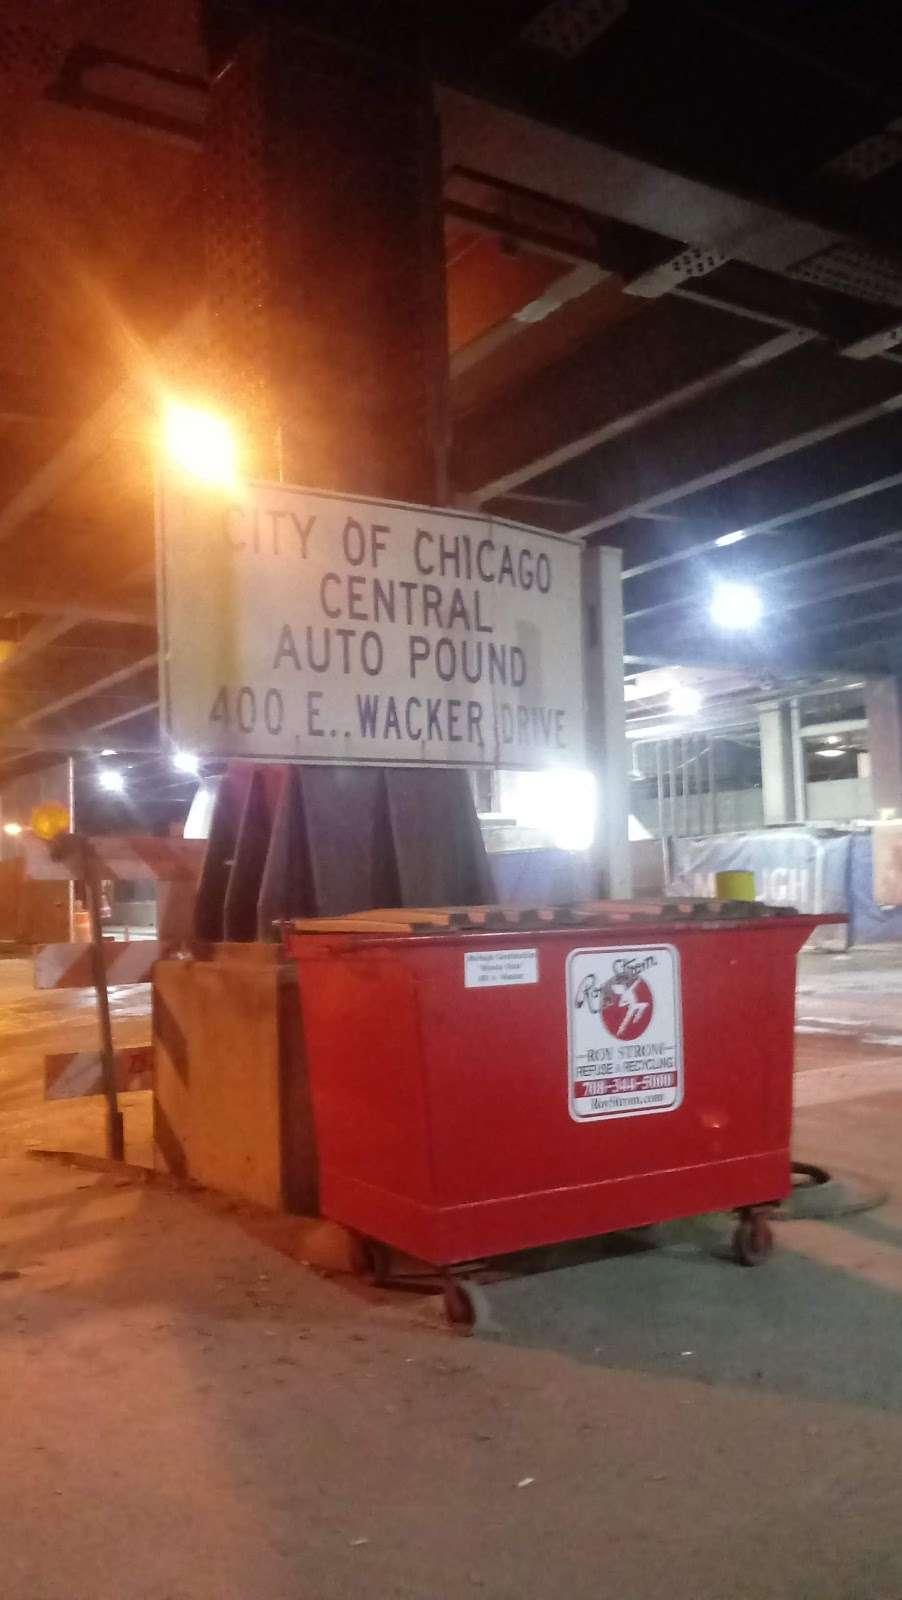 City of Chicago Central Auto Pound - storage  | Photo 8 of 10 | Address: 400 E Lower Wacker Dr, Chicago, IL 60601, USA | Phone: (312) 744-7550